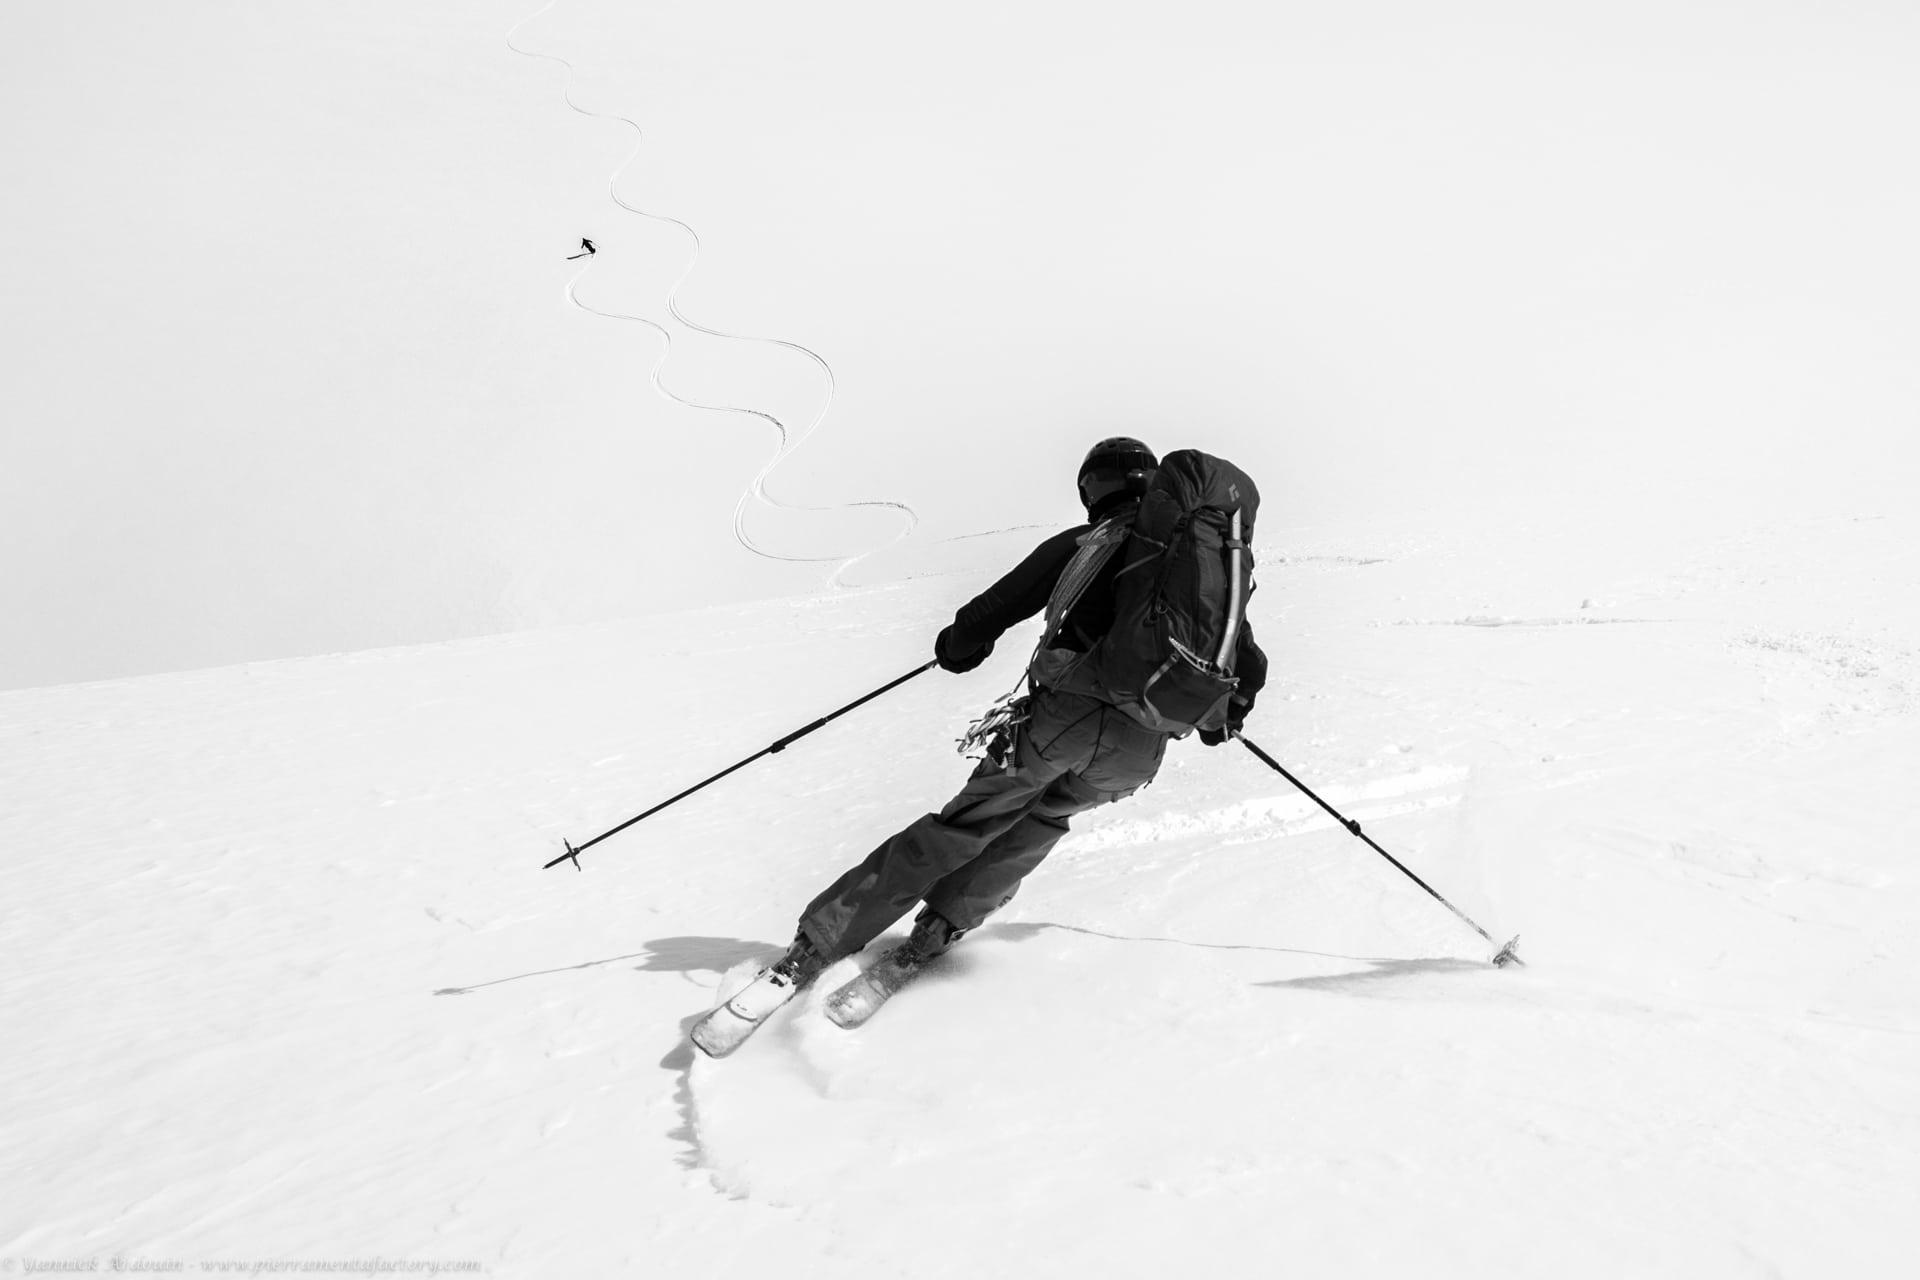 Chamonix Zermatt à ski